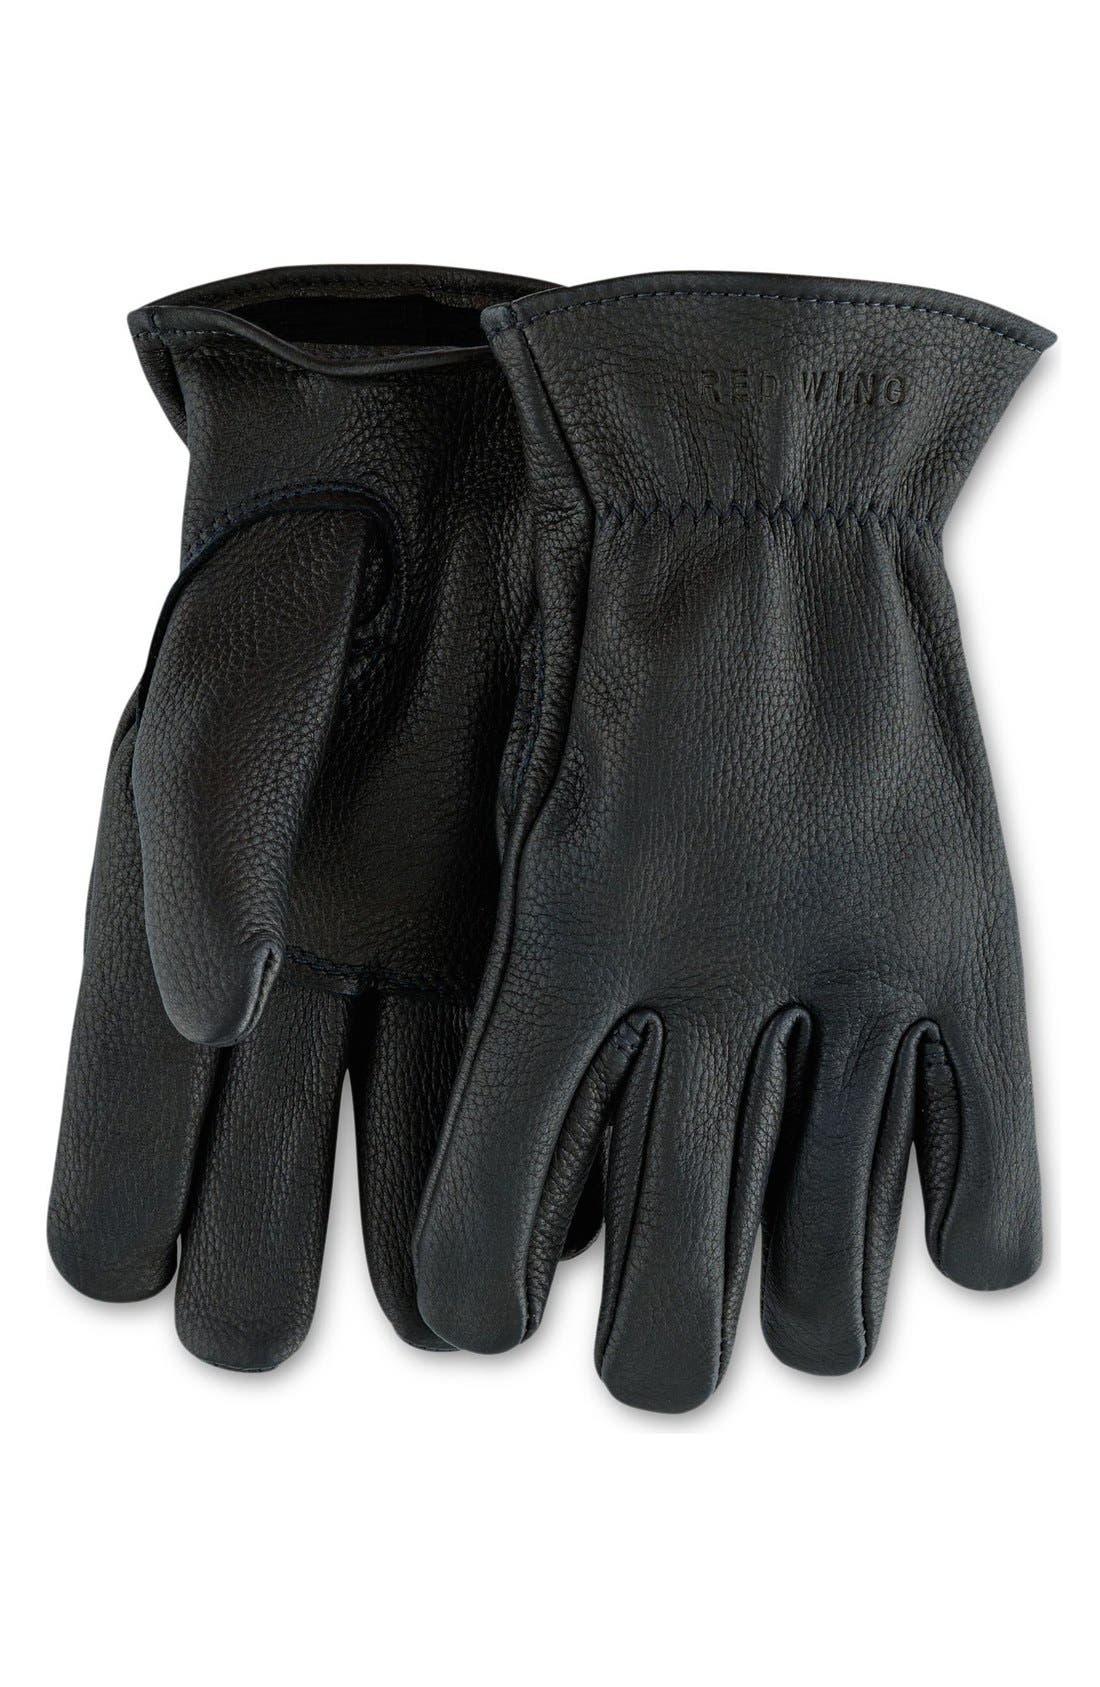 Mens leather gloves topman - Mens Leather Gloves Topman